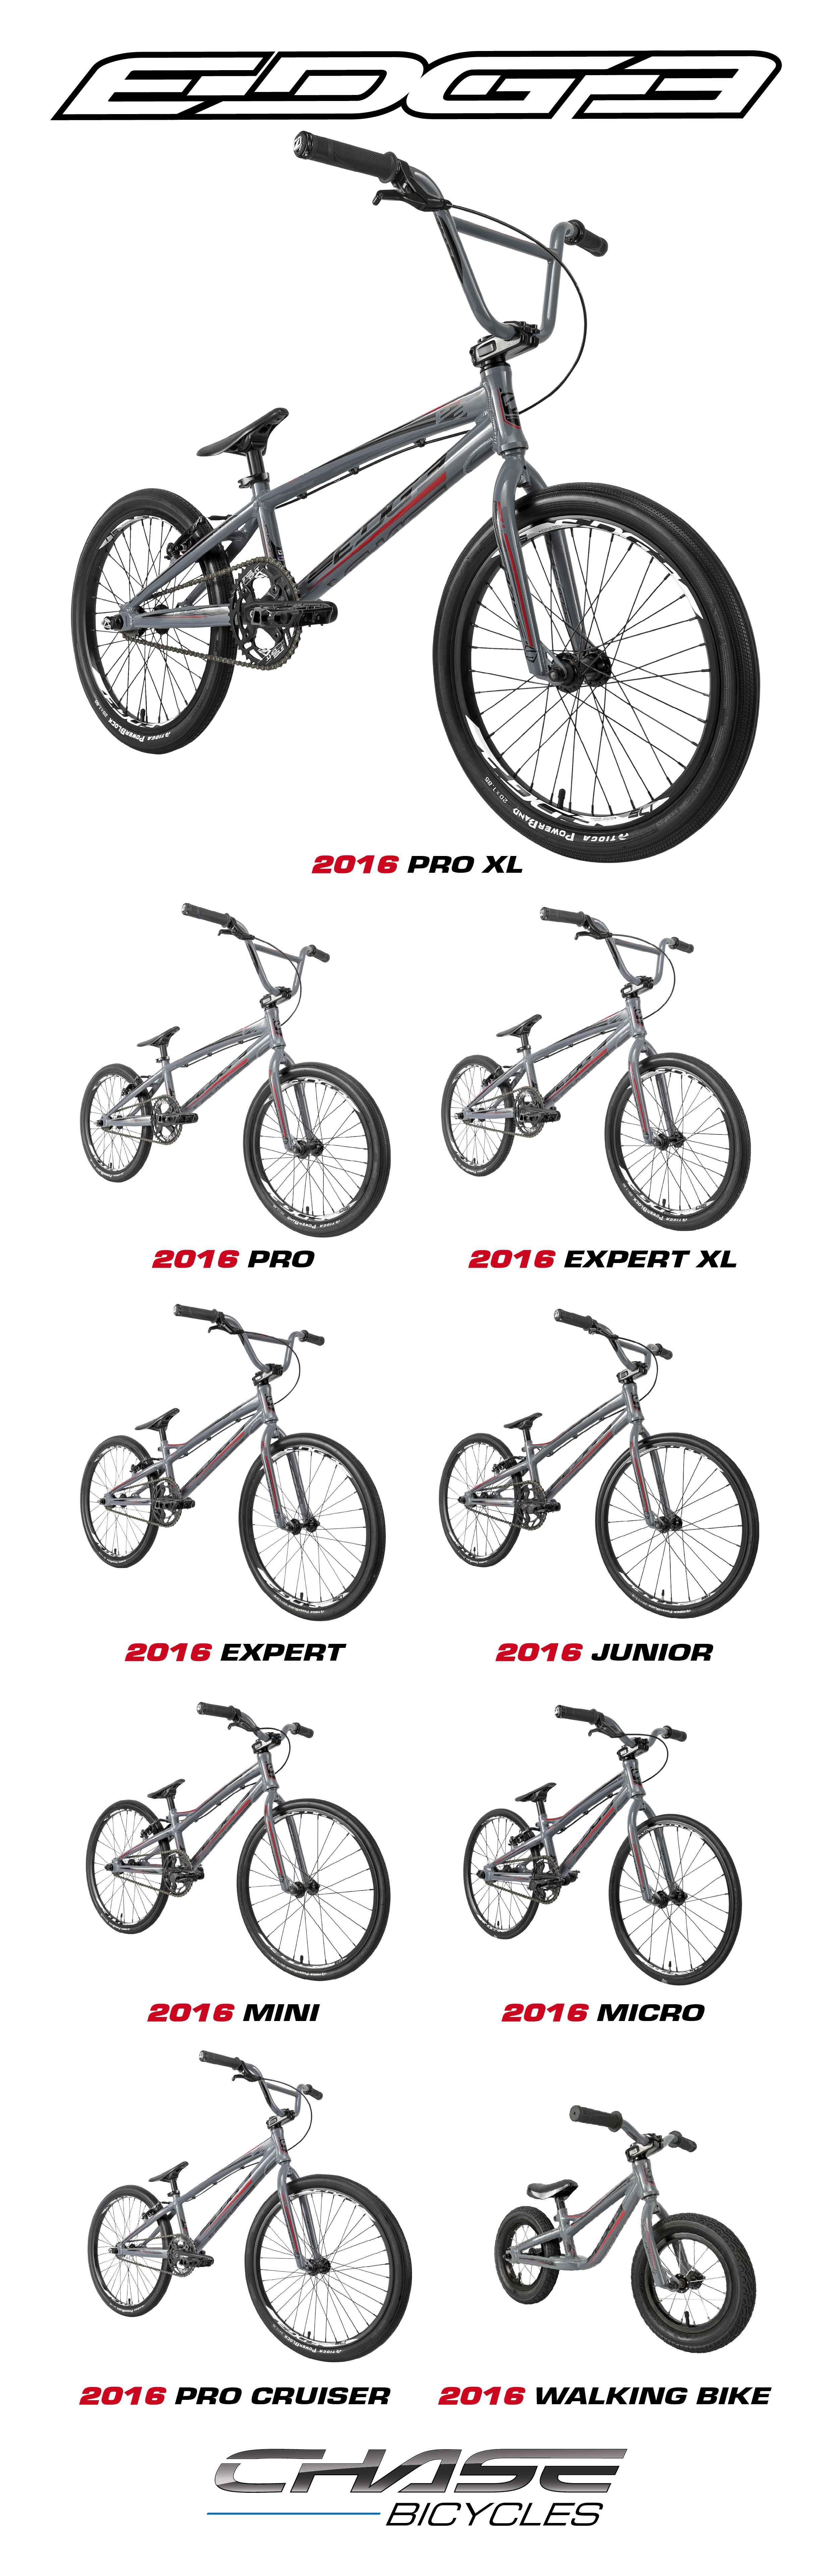 chase-edge-bikes